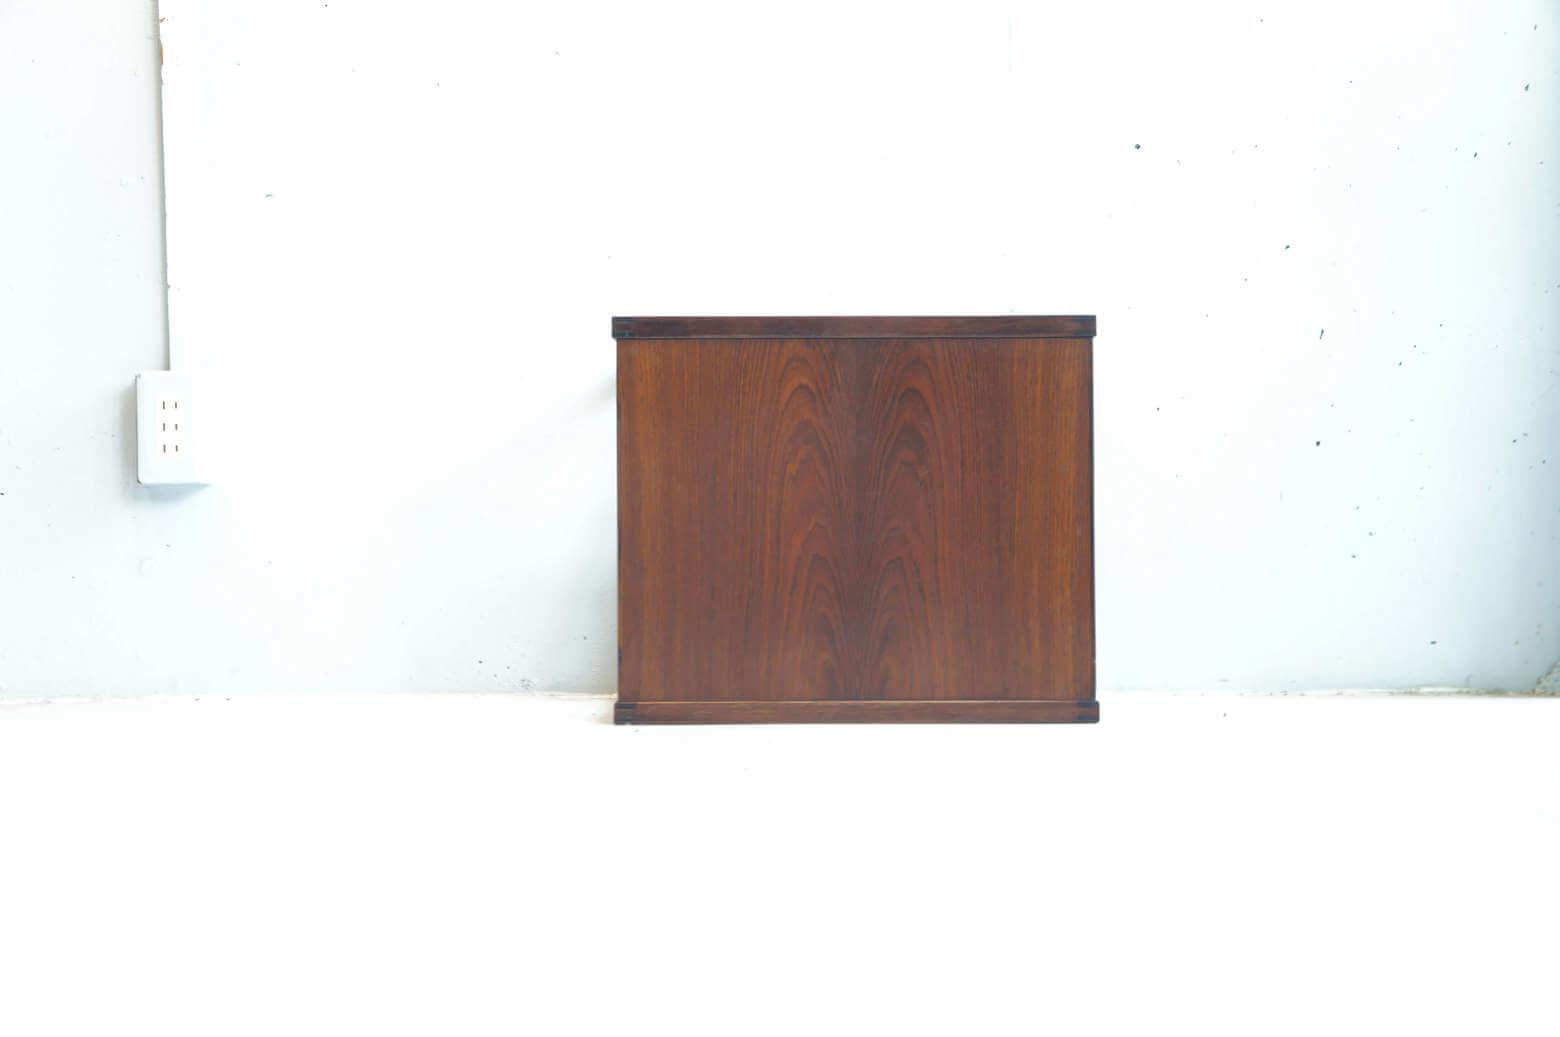 Vildbjerg Møbelfabrik Design by Kai Kristiansen Rose Wood Nesting Table One Piece / カイ クリスチャンセン デザイン ネストテーブル